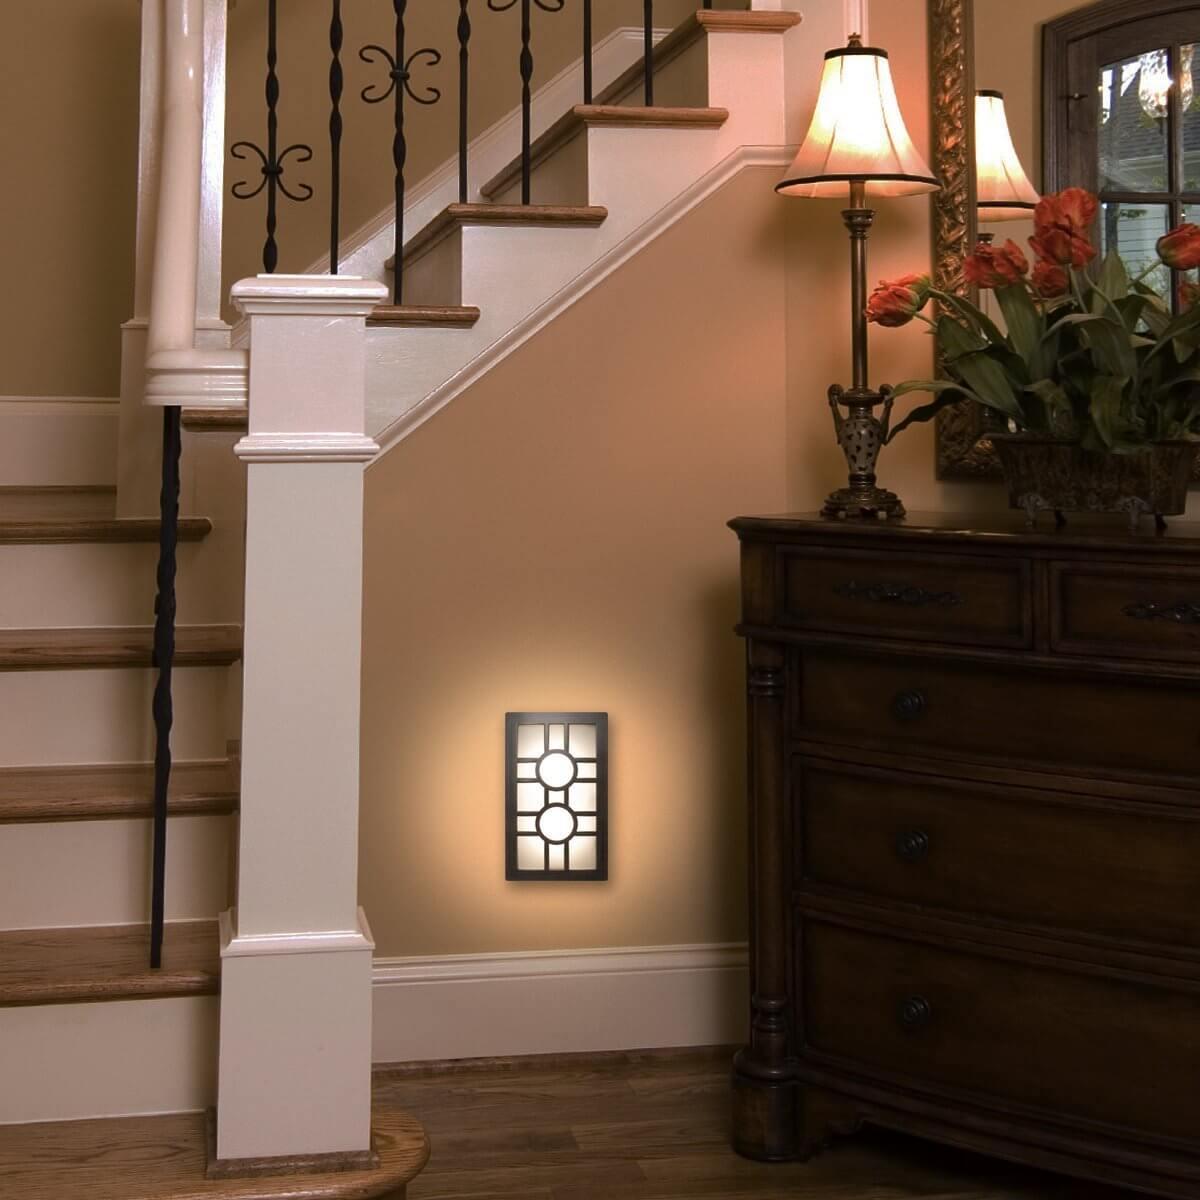 if decorative night light - Decorative Night Lights